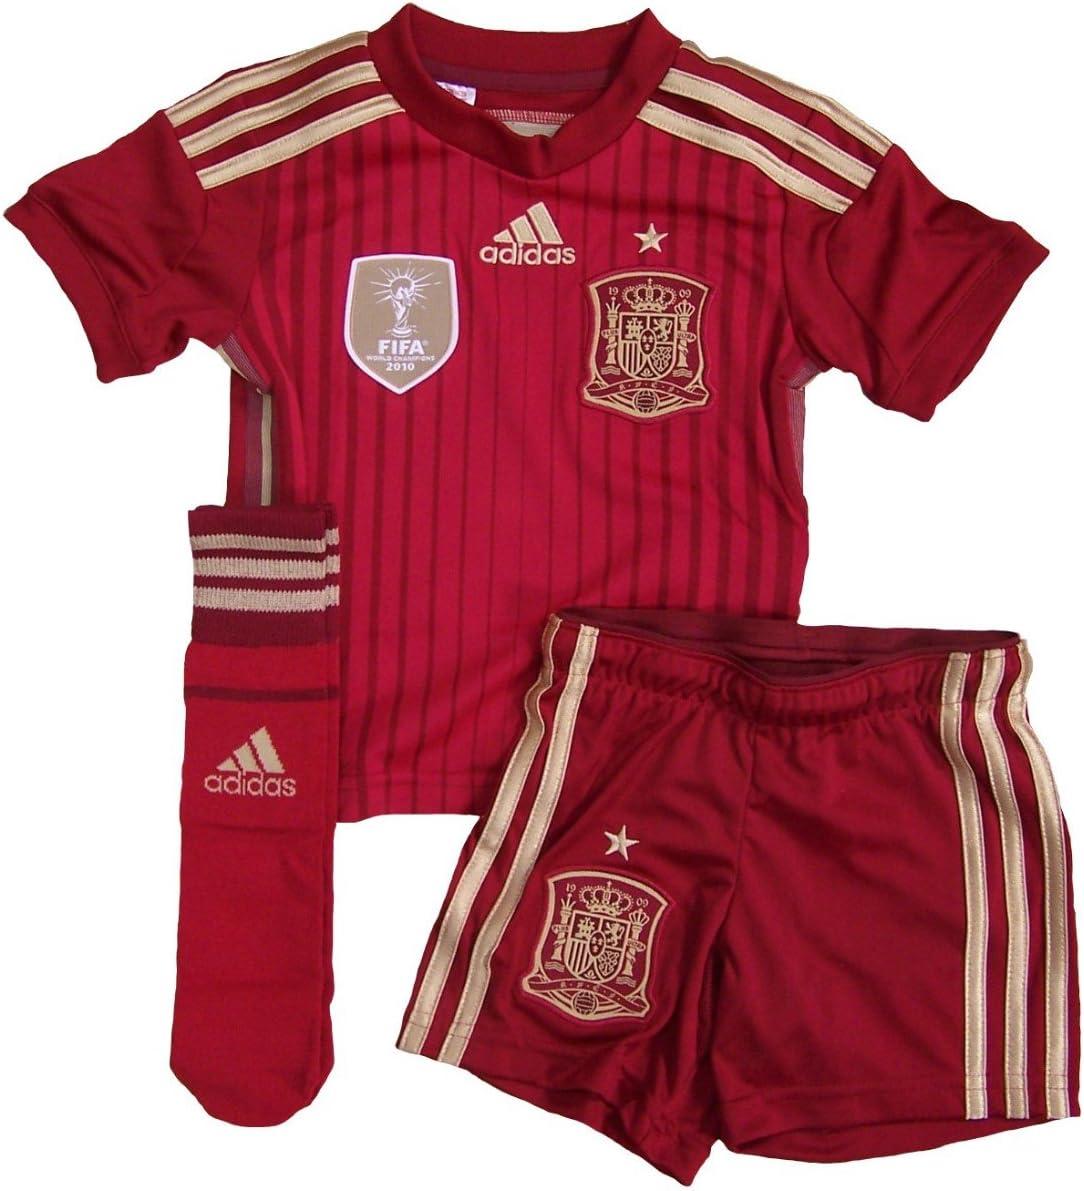 adidas - Equipment Spain Junior 2014, Color Victory Red, Talla 13 ...